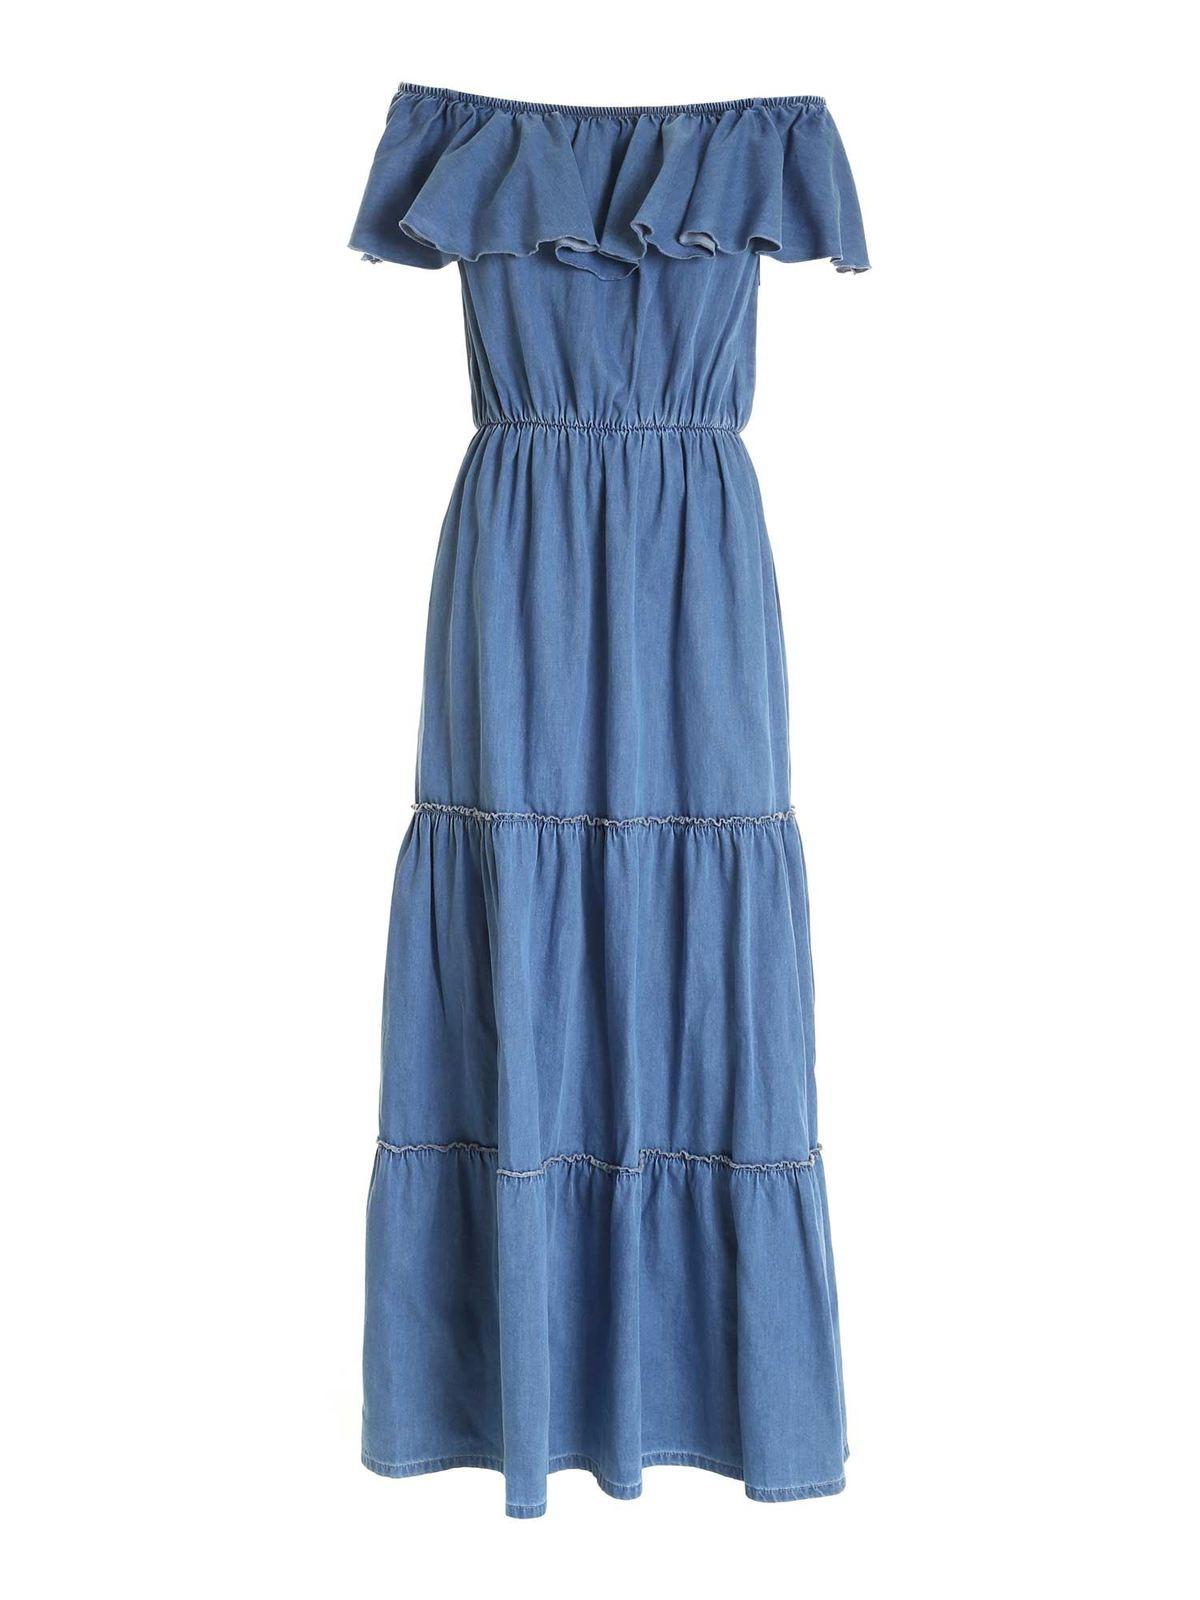 Federica Tosi Dresses FLOUNCES DRESS IN LIGHT BLUE